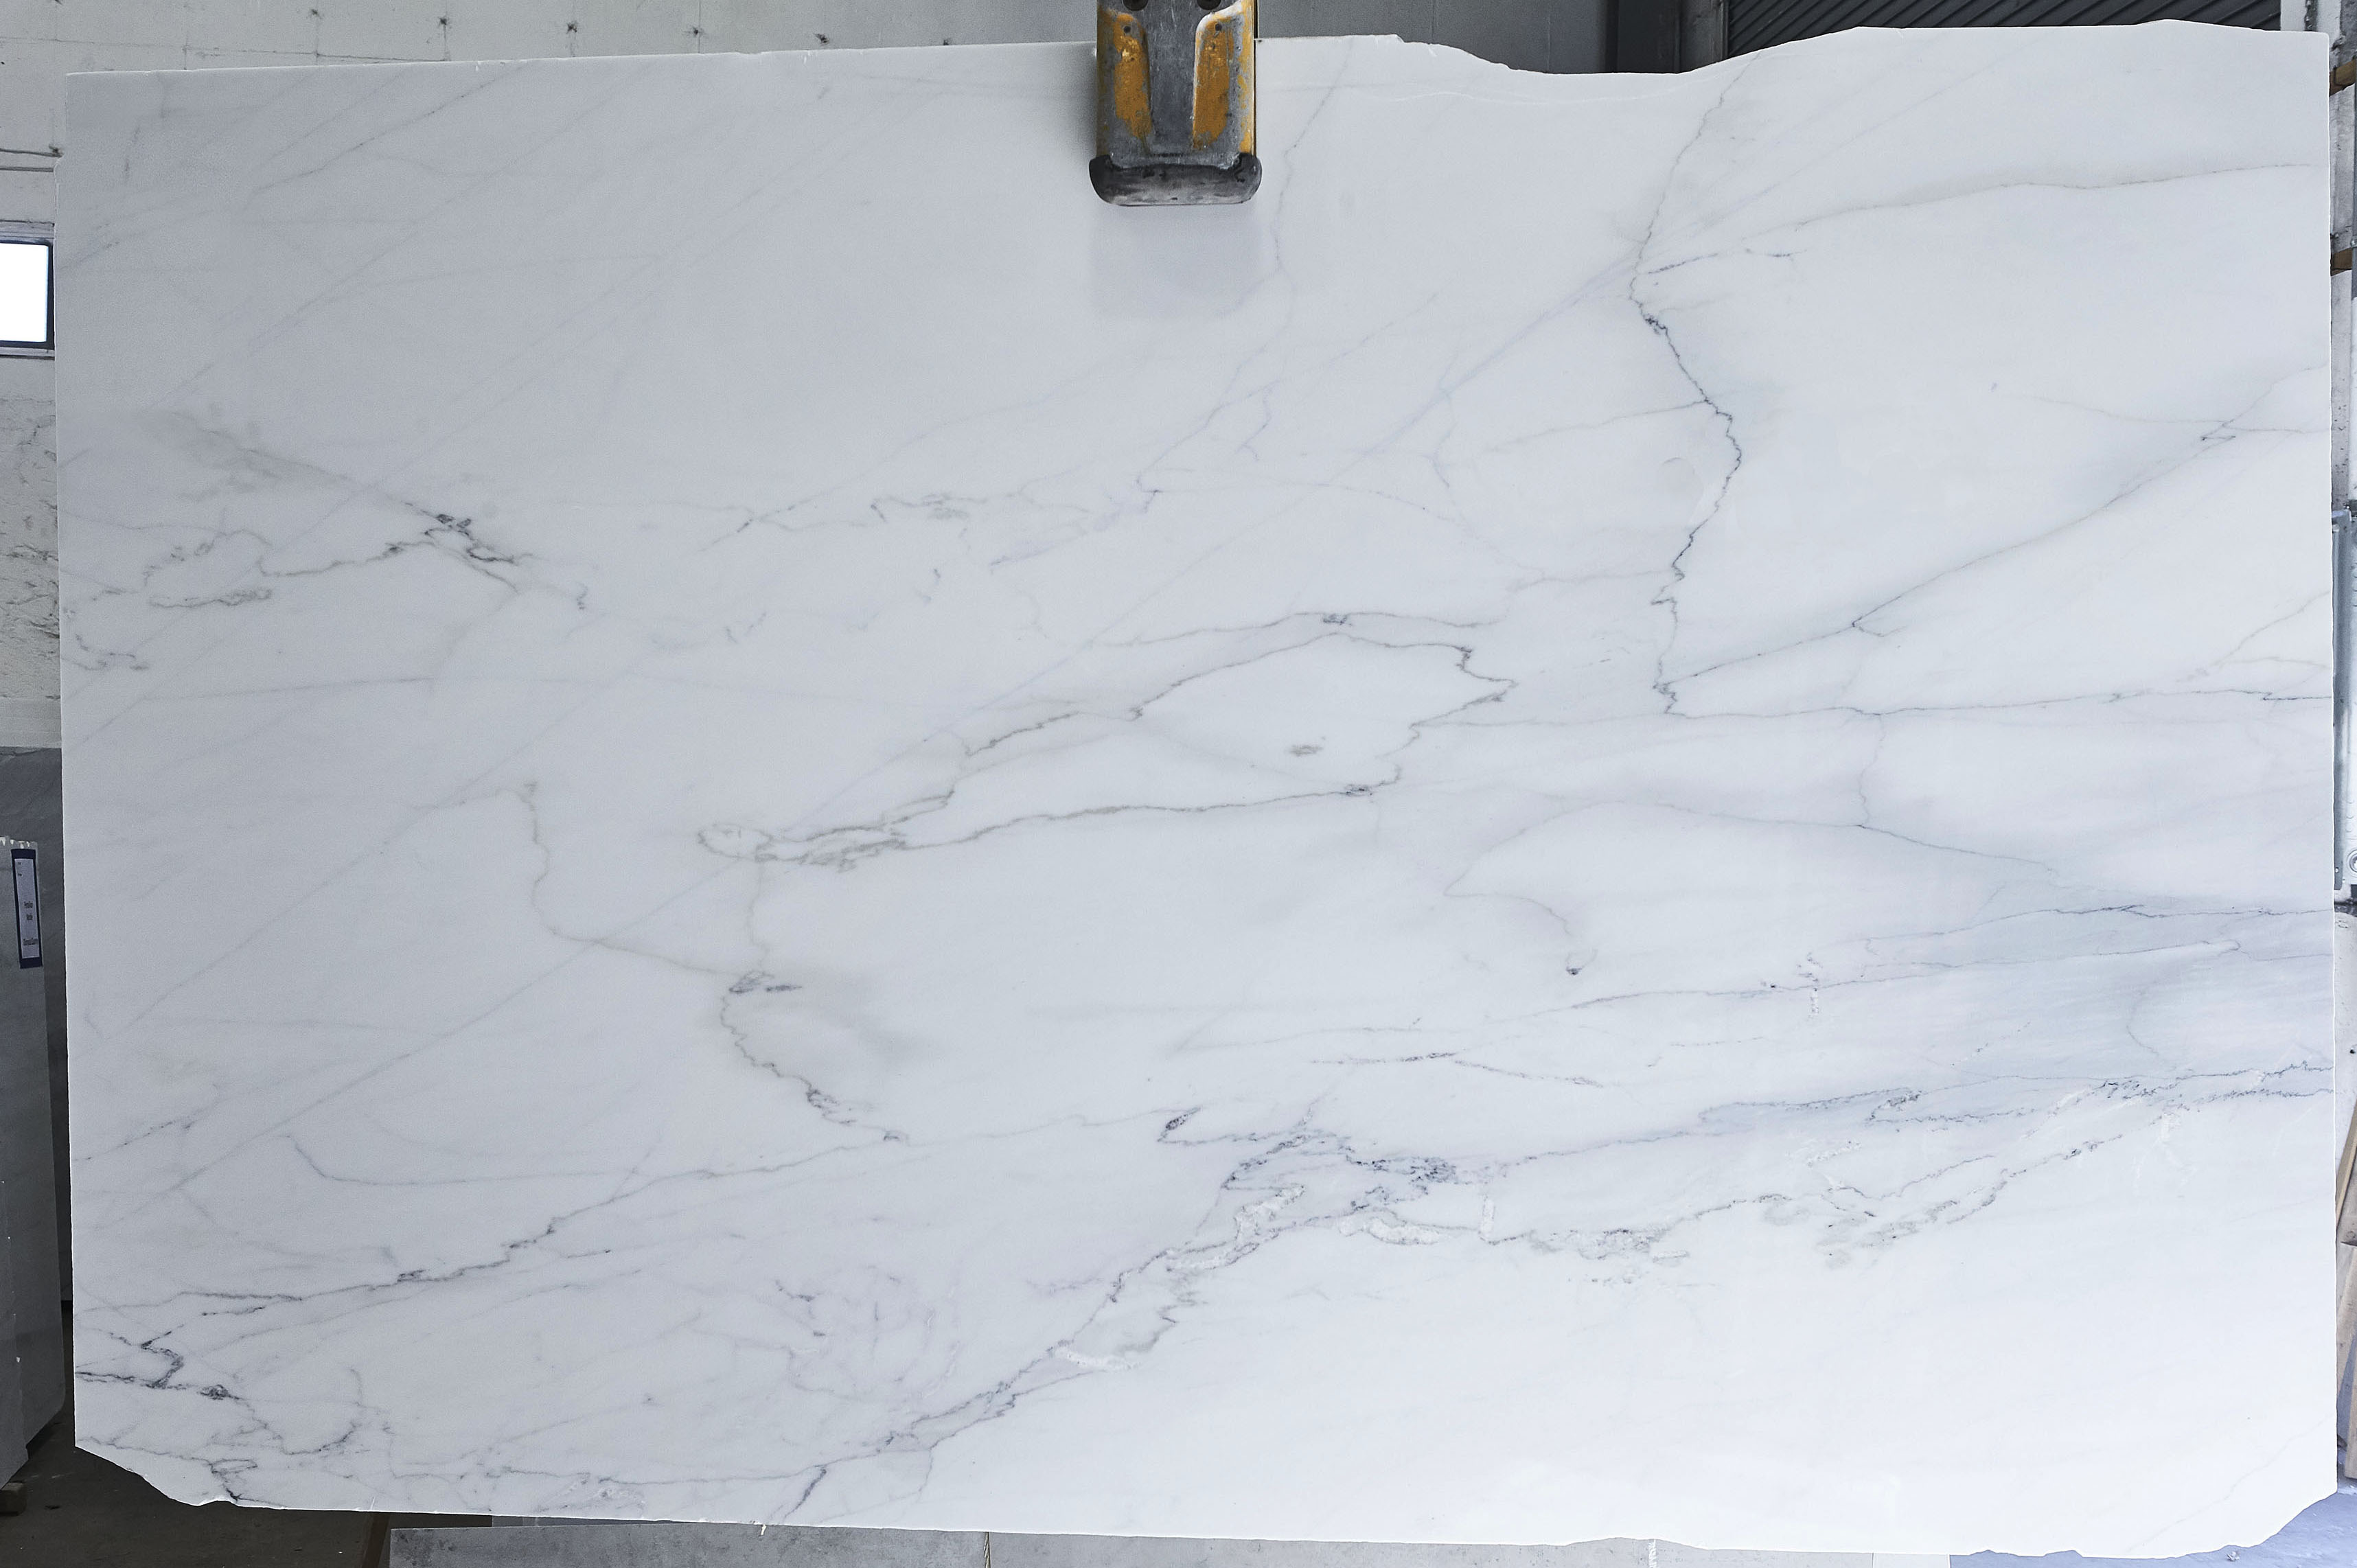 Calacatta Lincoln 3Cm (112 x 72) (12 Slb